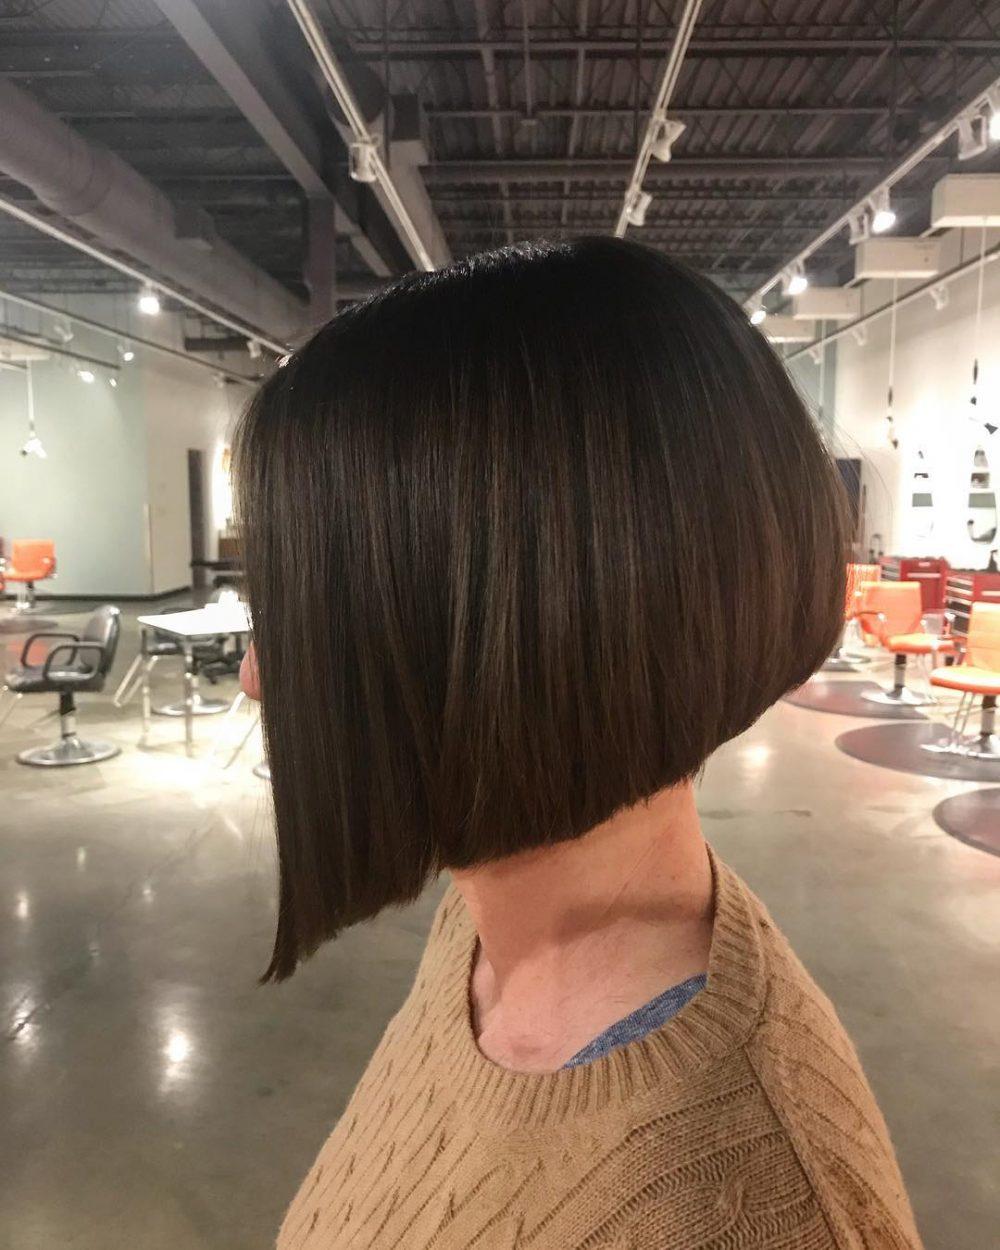 Angled-Forward Bob hairstyle